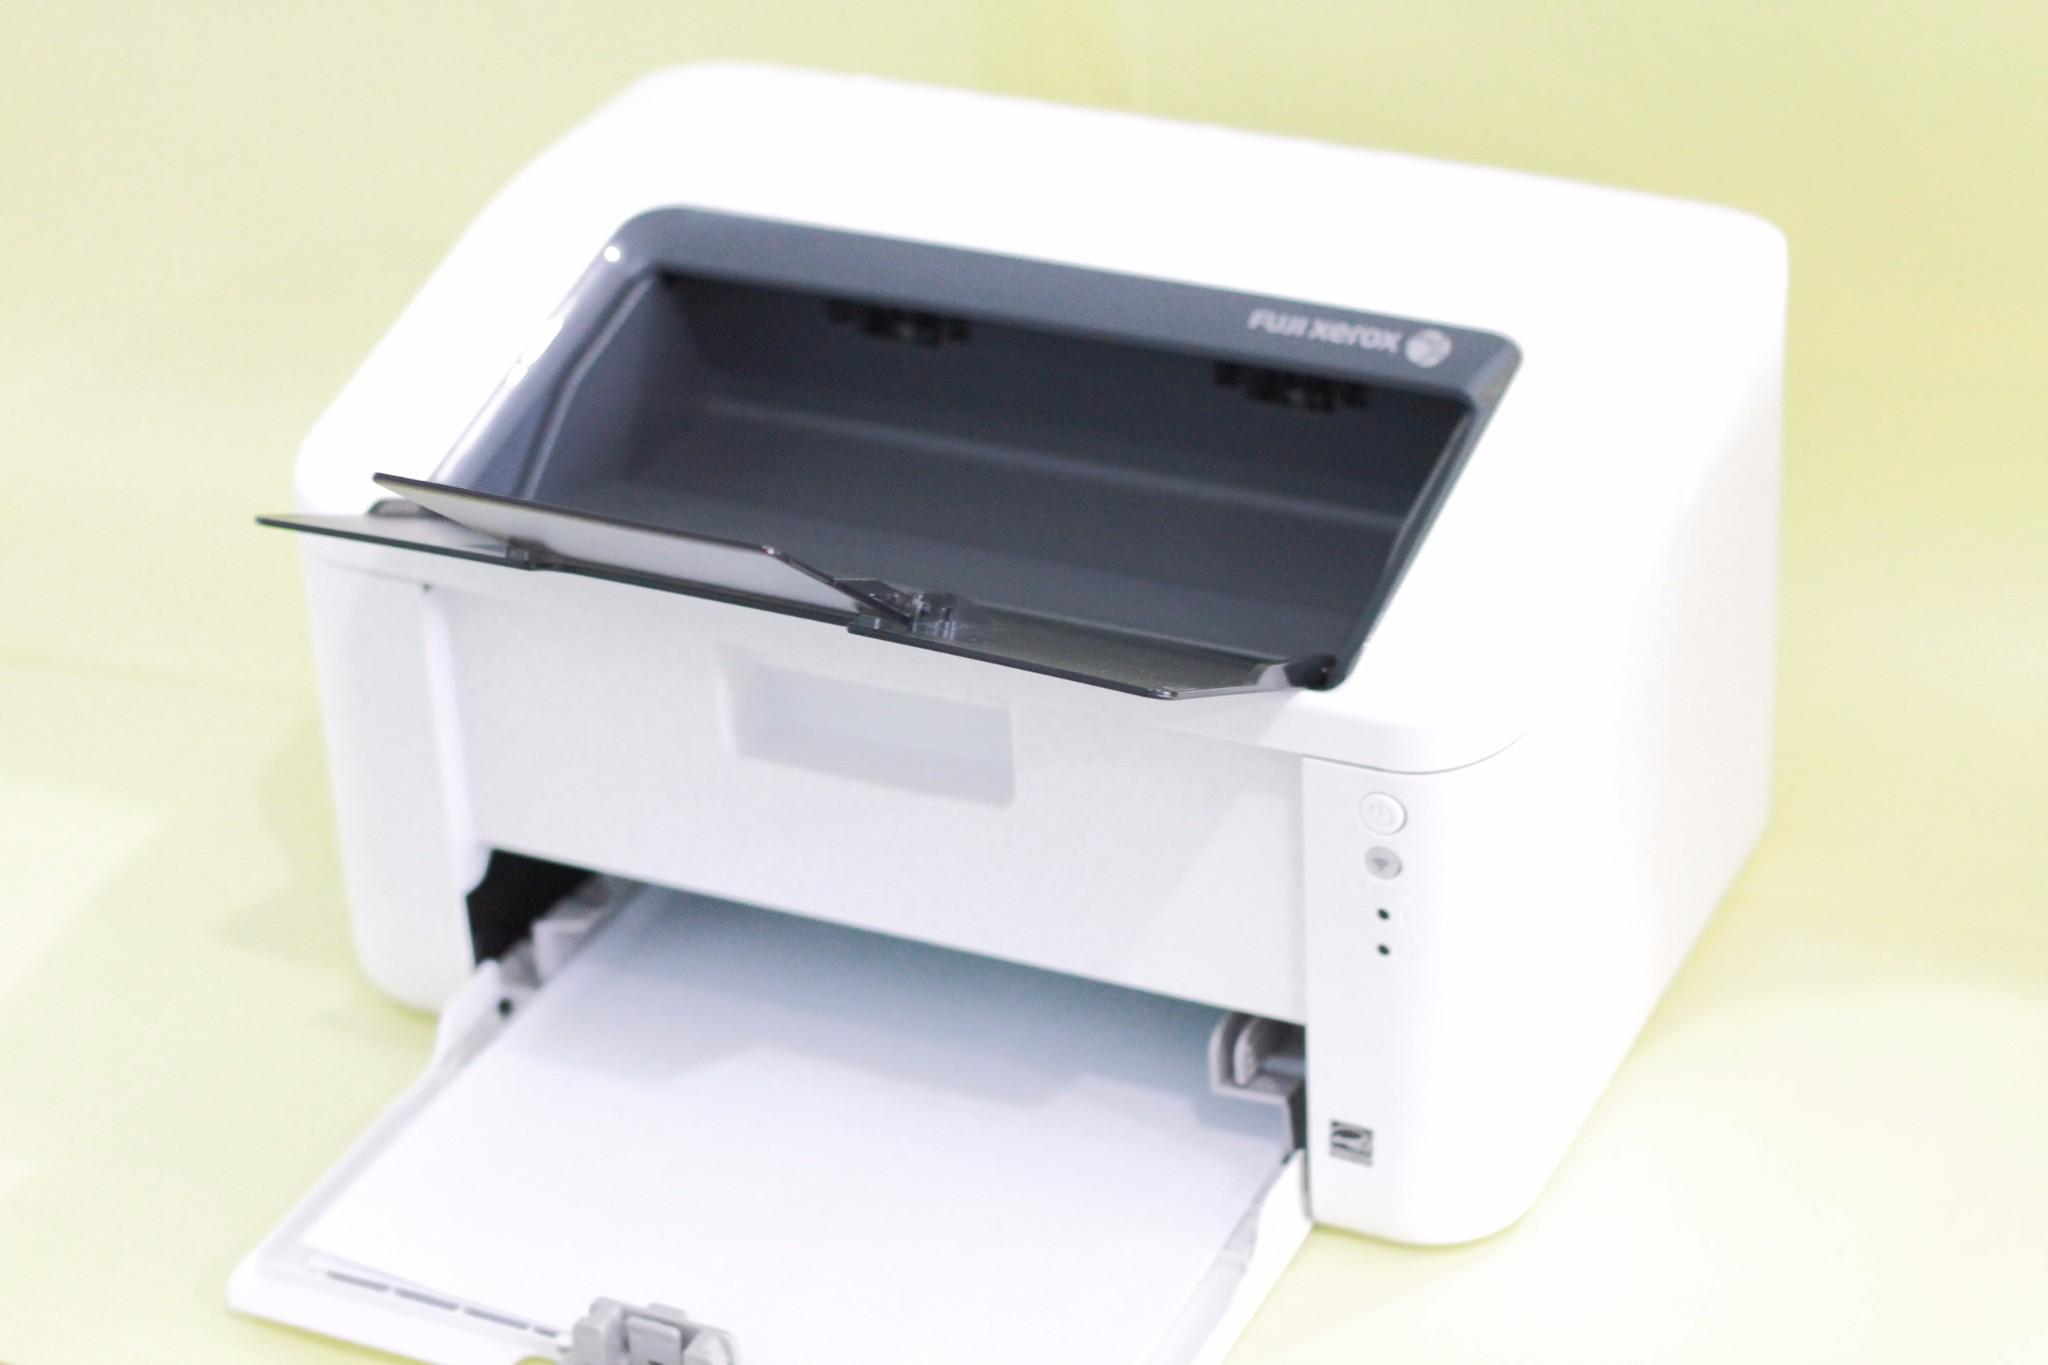 Jual Fuji Xerox Docuprint P115w Wireless Monochrome Posix P115 W Tokopedia